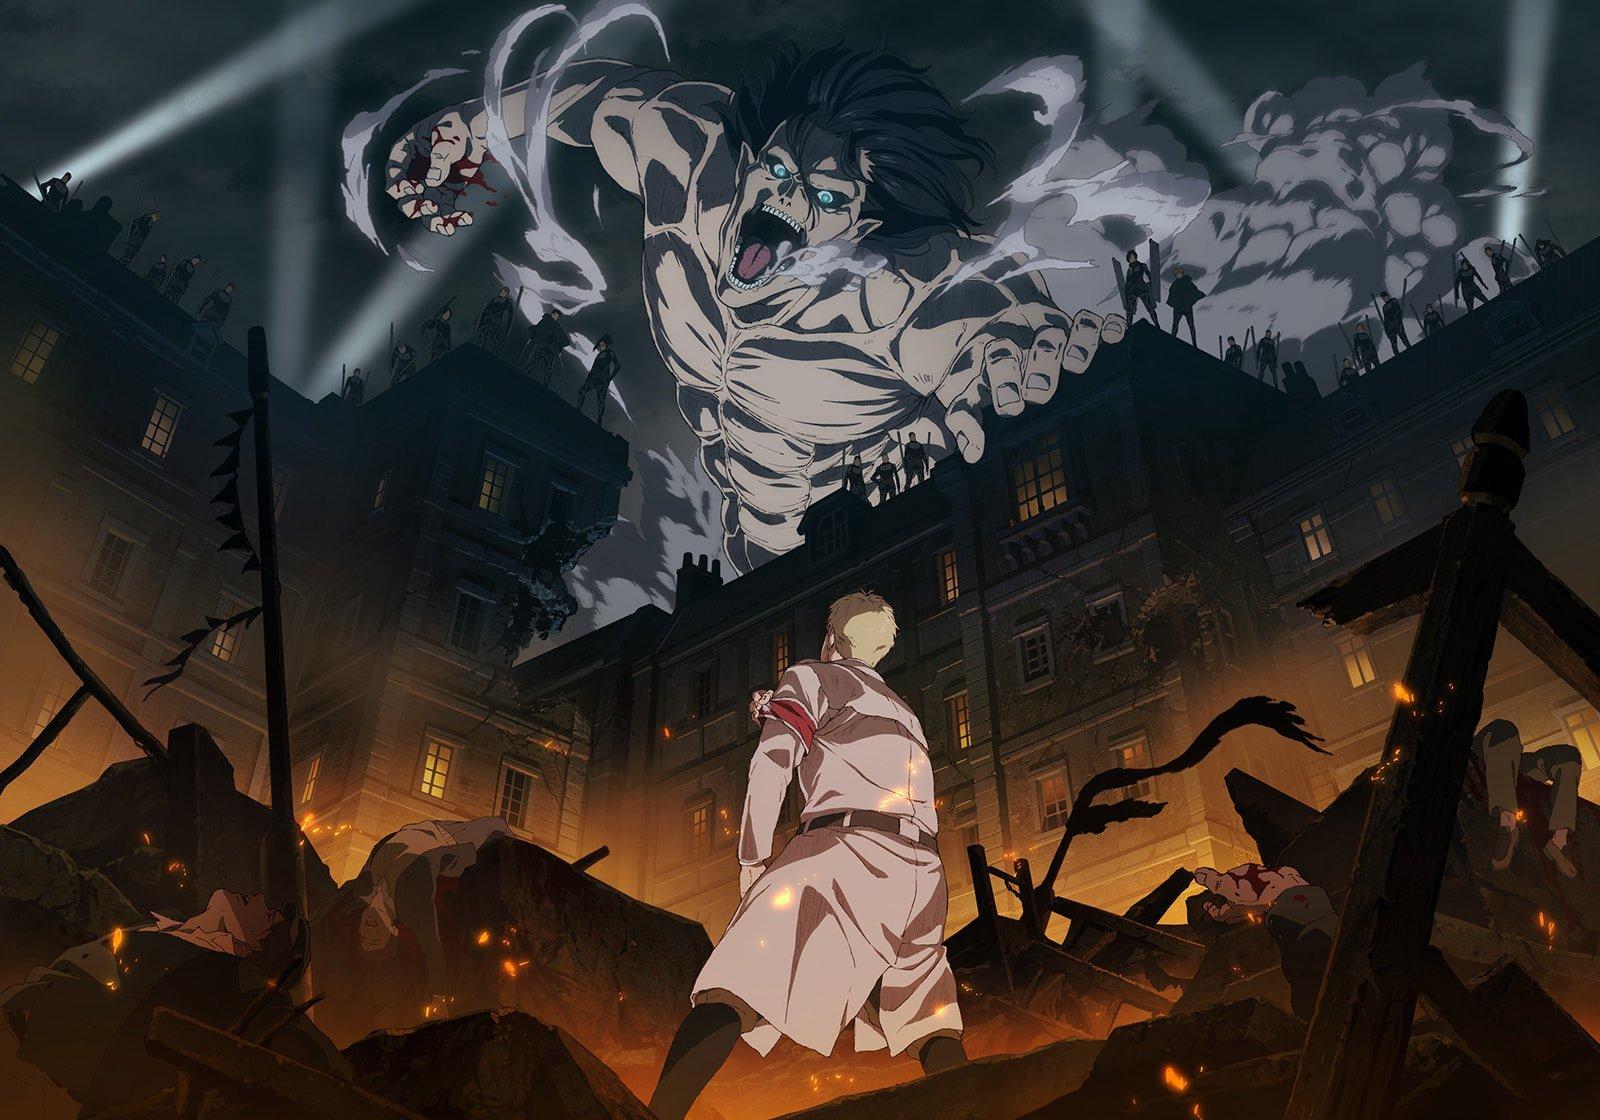 O canal da Pony Canyon no YouTube acaba de divulgar o trailer da última temporada de Attack On Titan ou Shingeki no Kyojin.